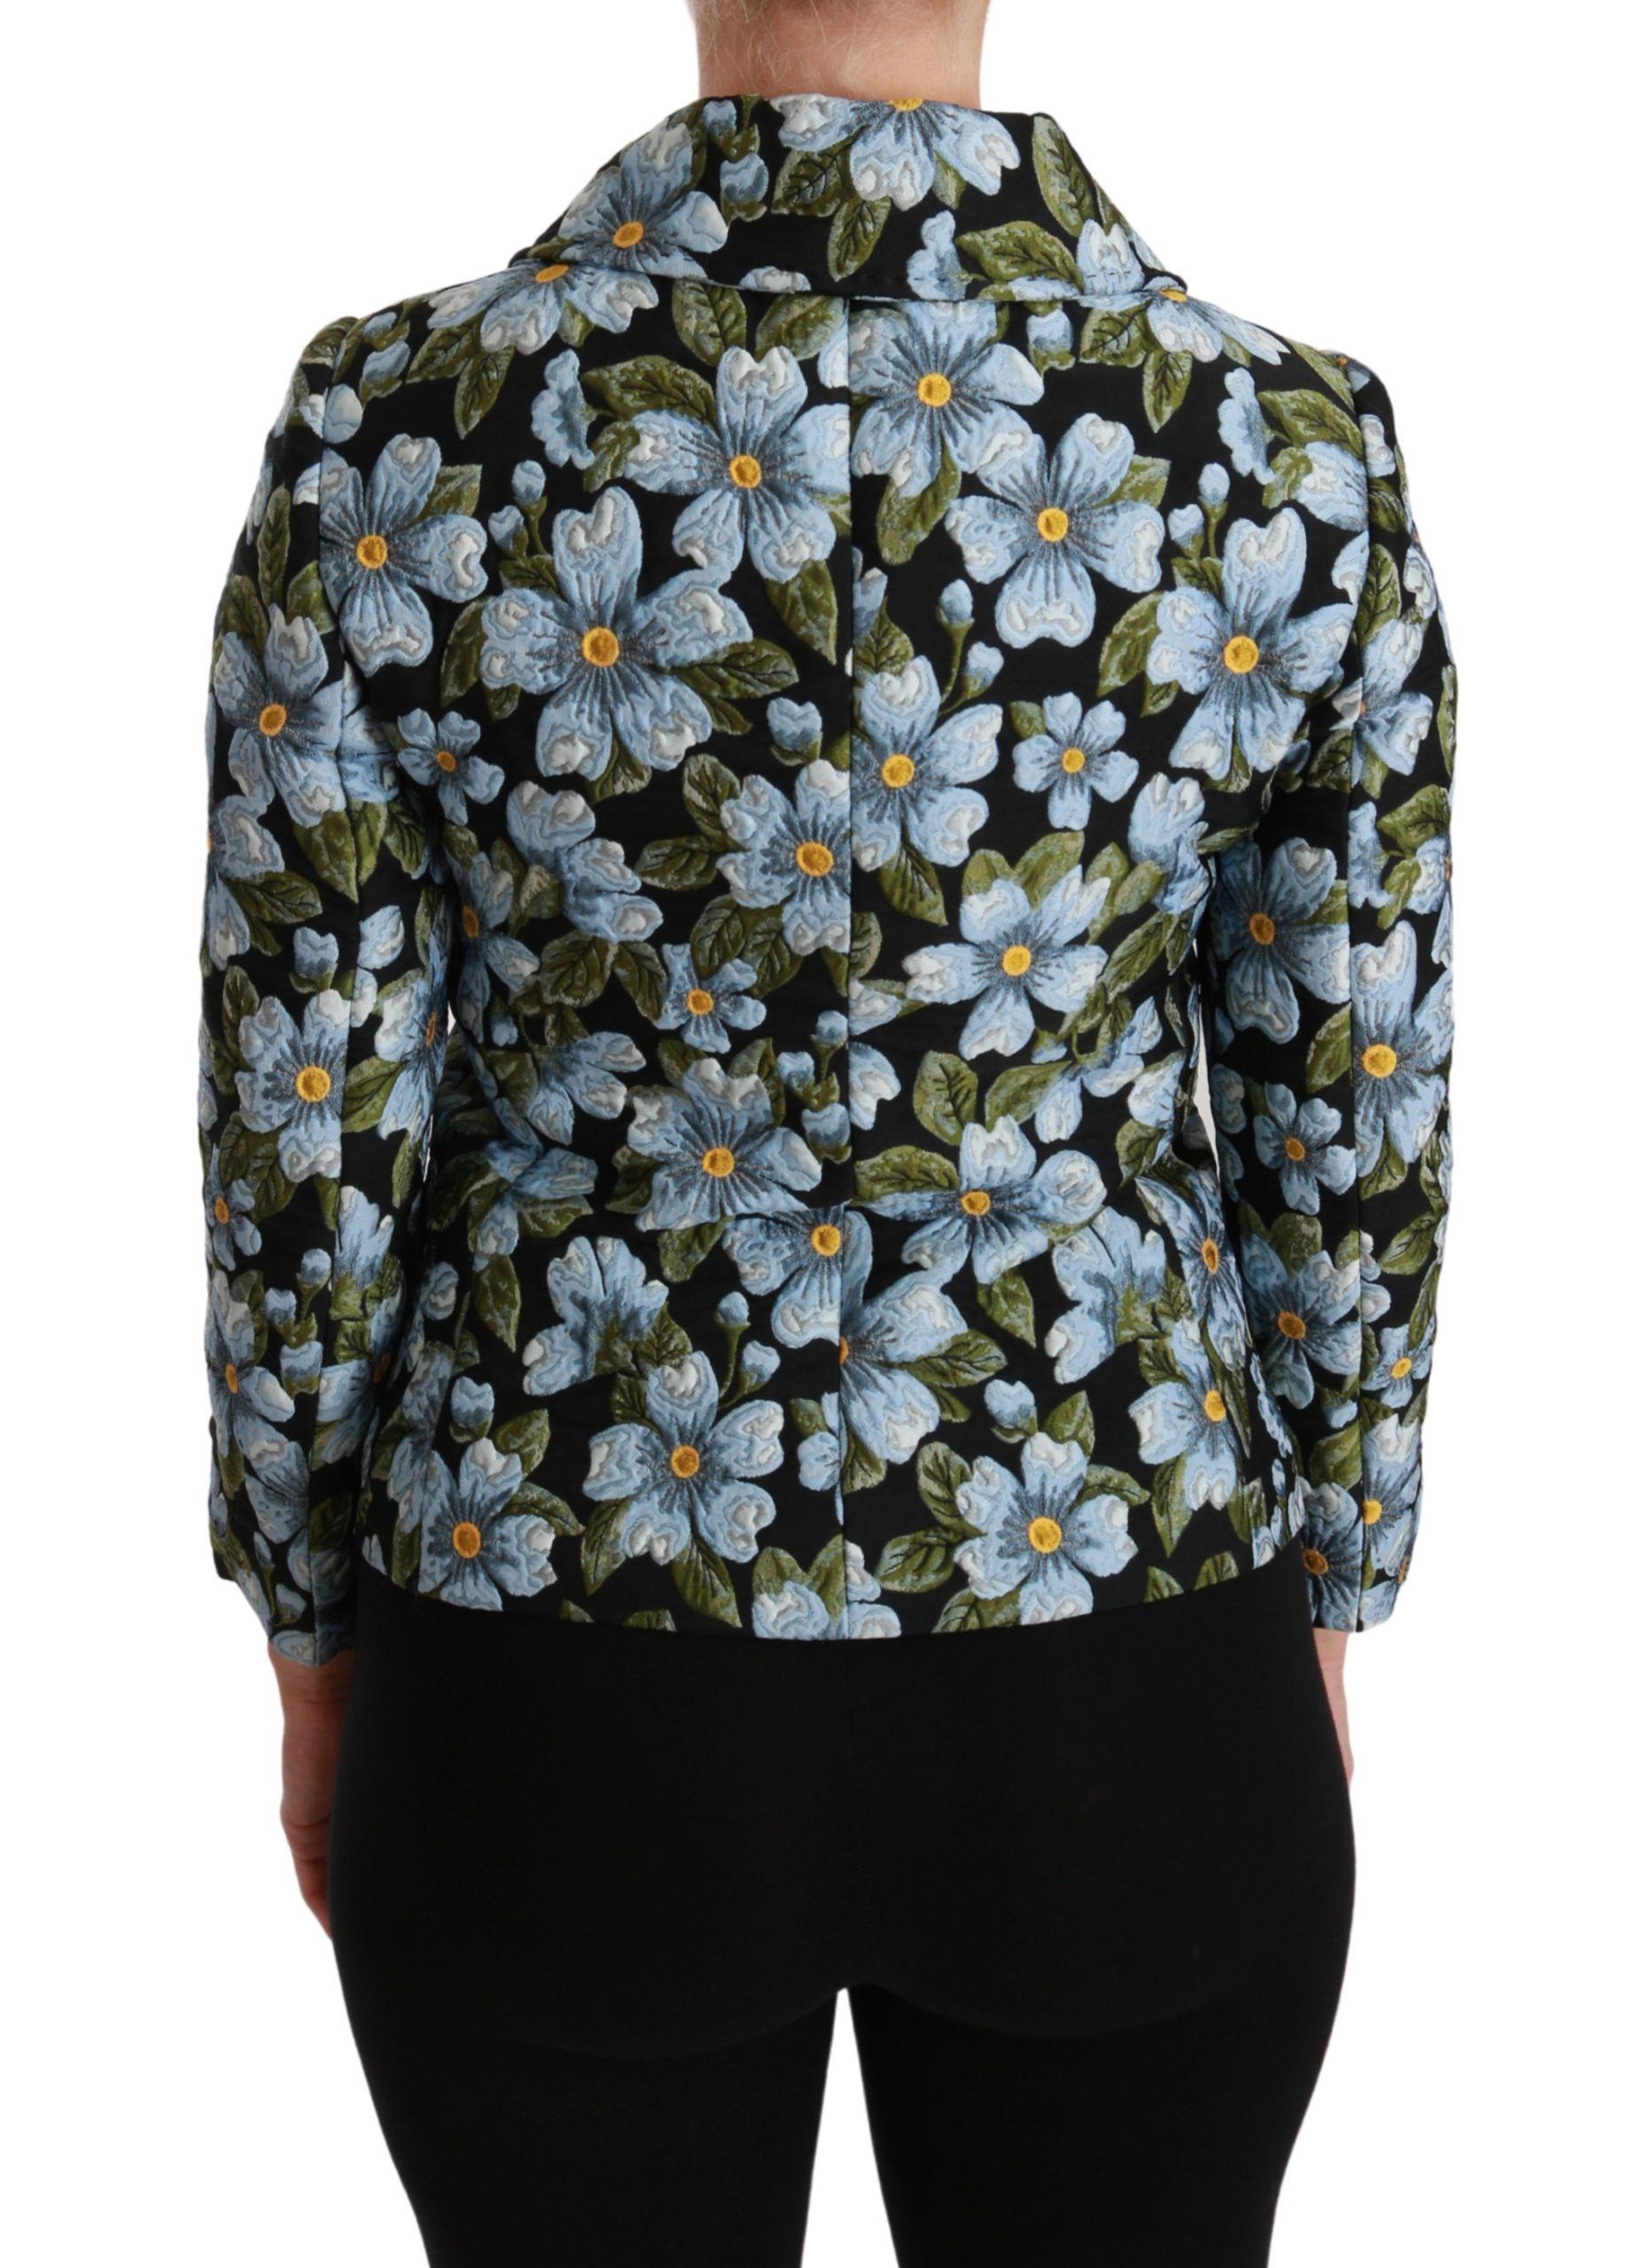 Z ZEGNA Black Striped Two Piece 3 Button 100% Wool Suit